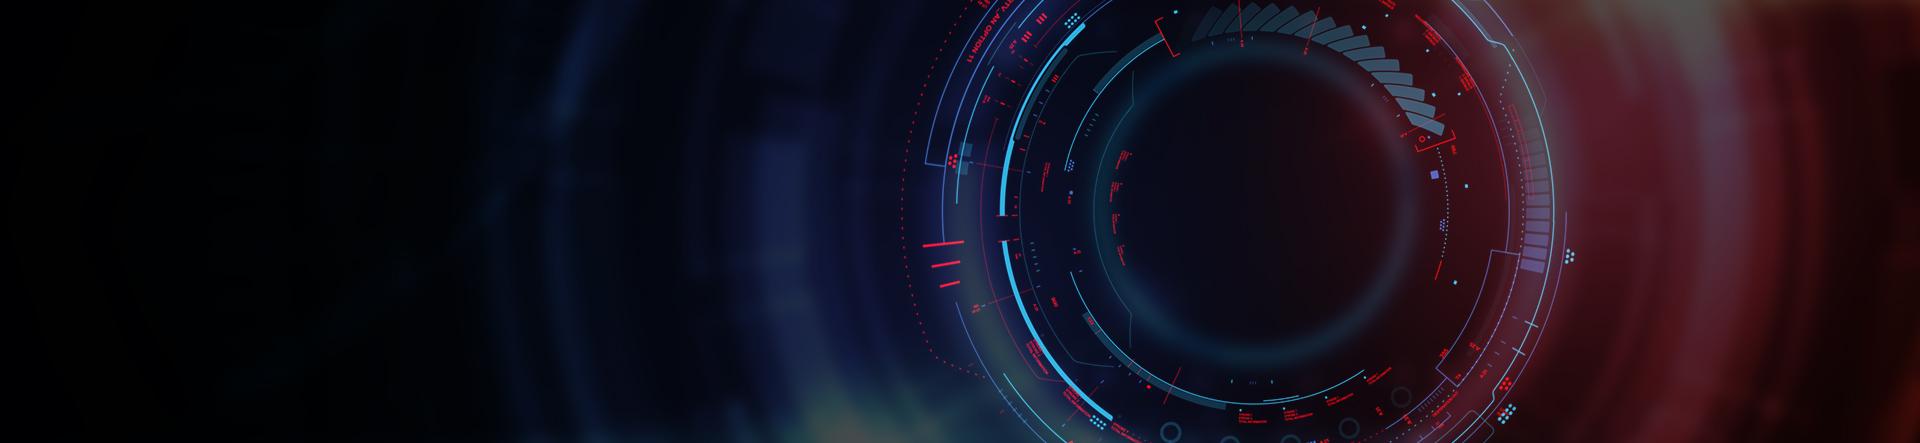 digital technology lens on blue red background